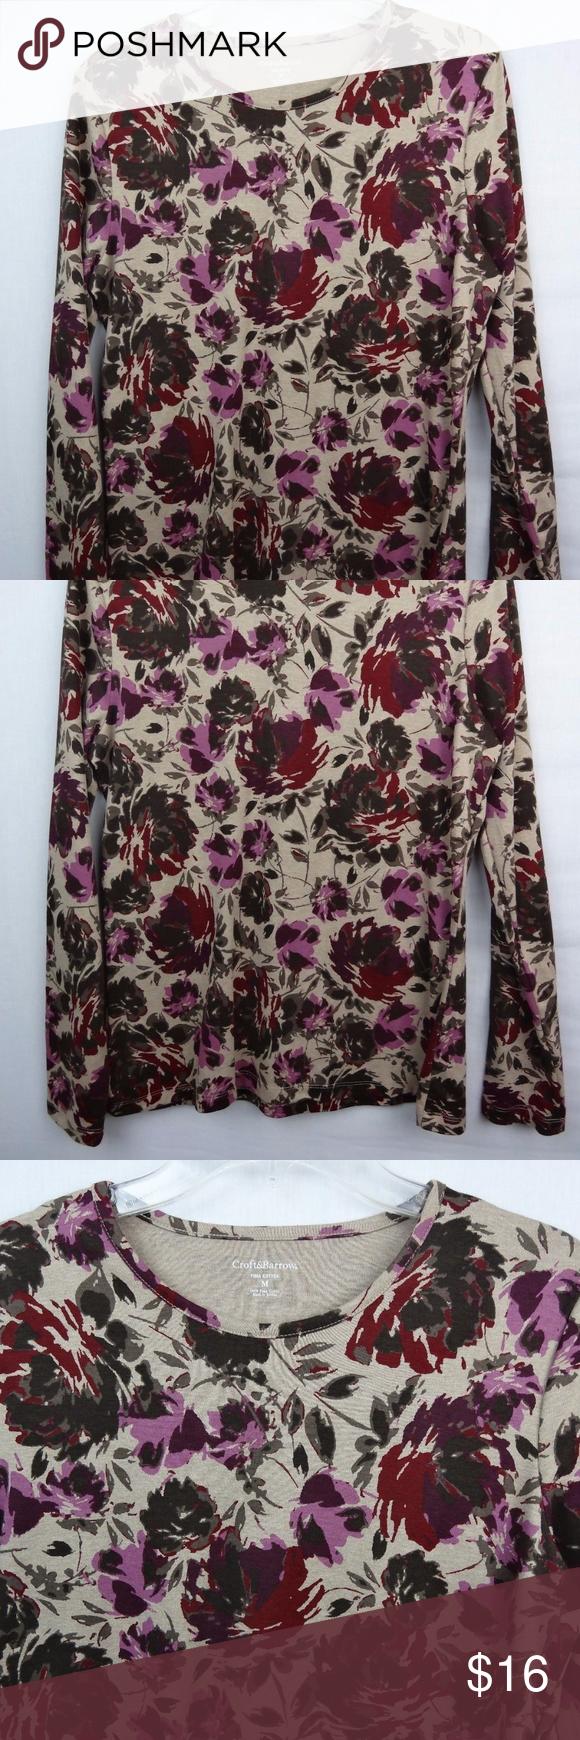 NWT Croft u Barrow Floral Long Sleeve T Shirt Med NWT  Barrow